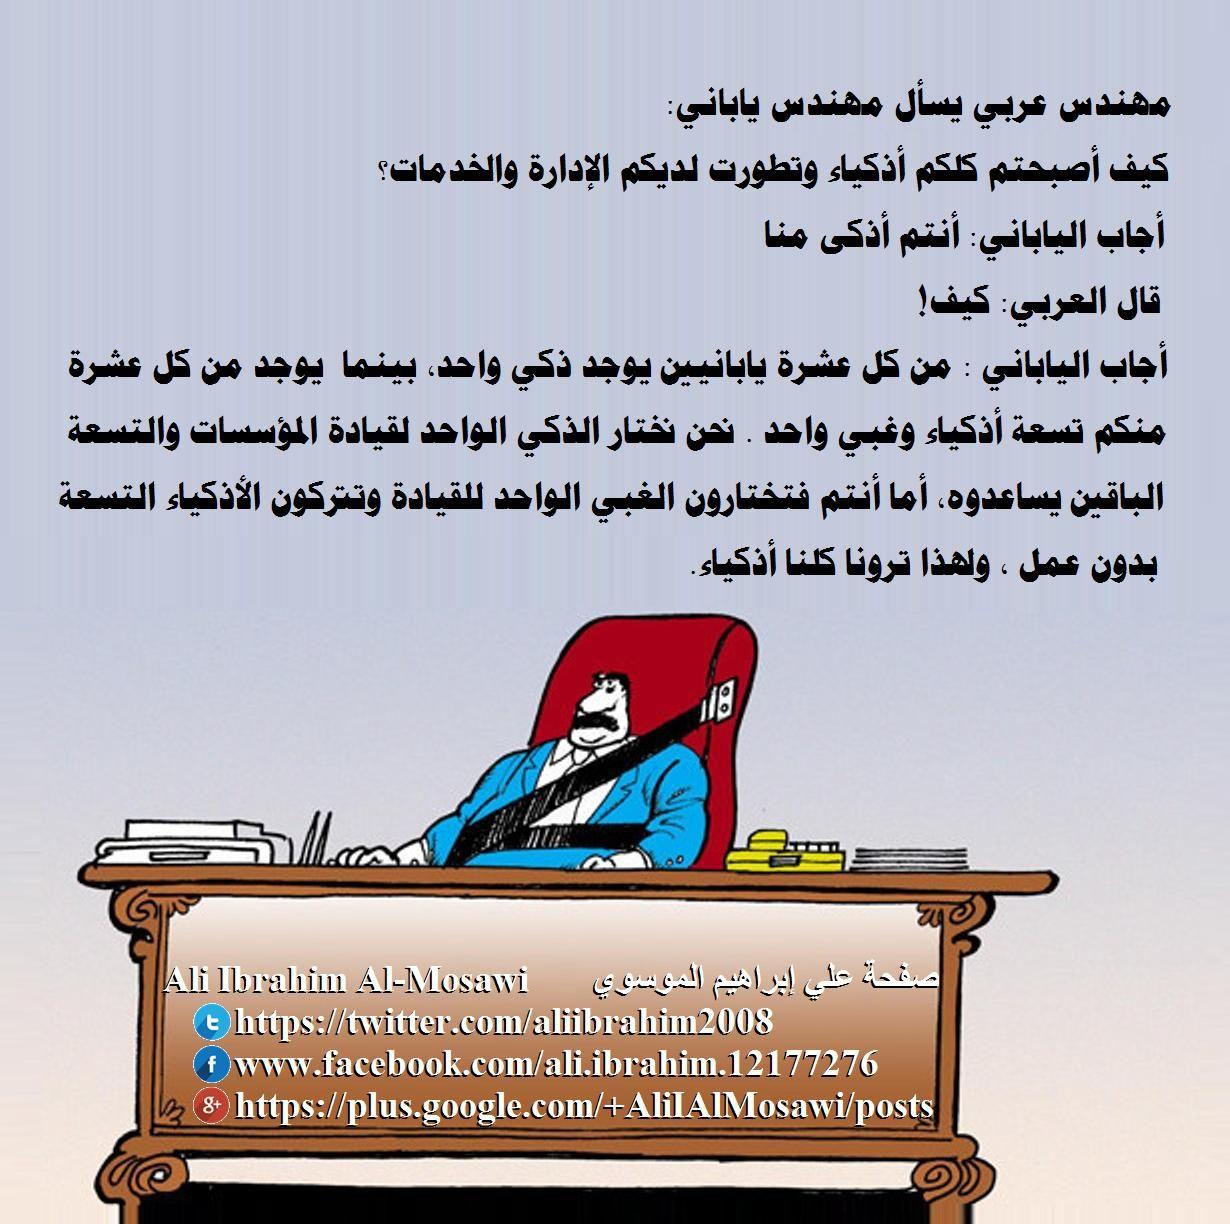 Pin By Ali Ibrahim Al Mosawi On خواطر وحكم Memes Ecard Meme Ecards